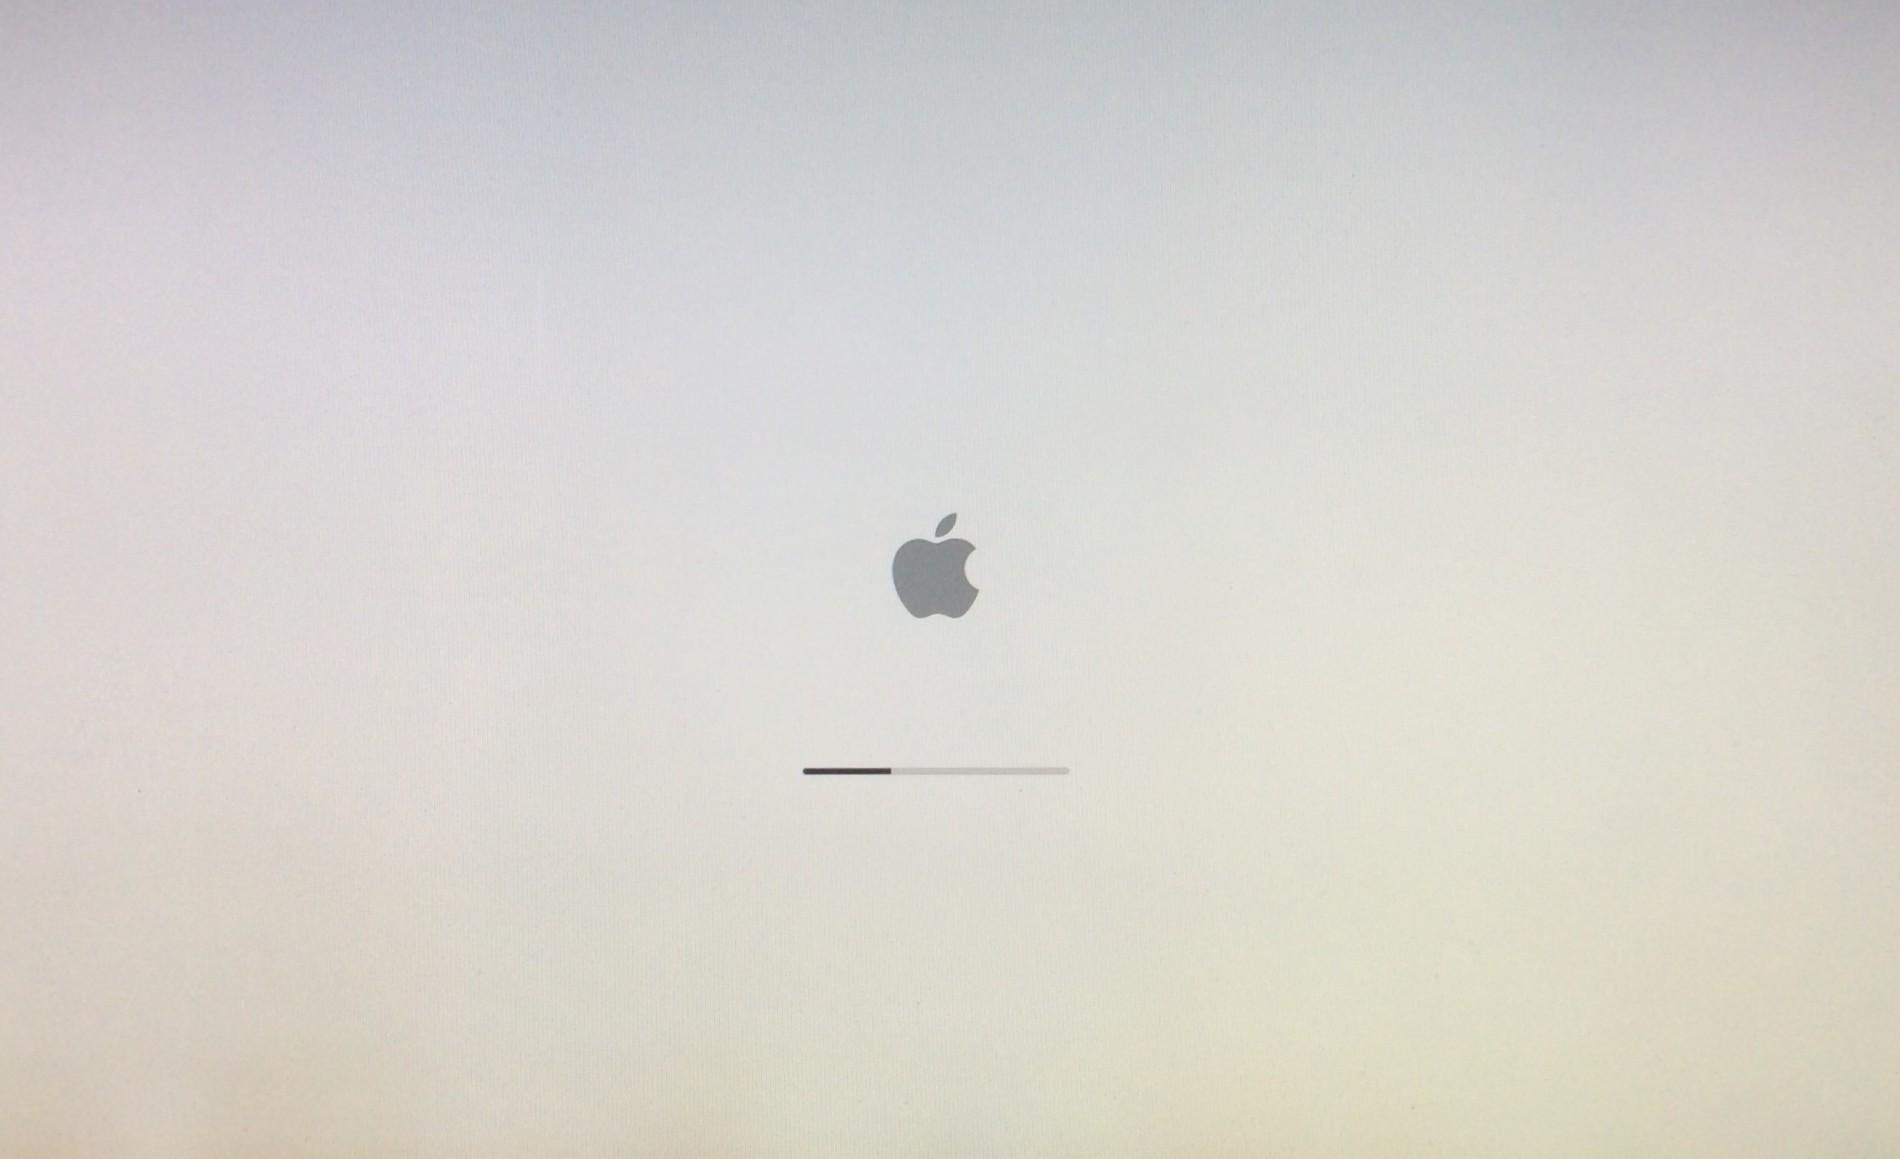 iMac white screen of death